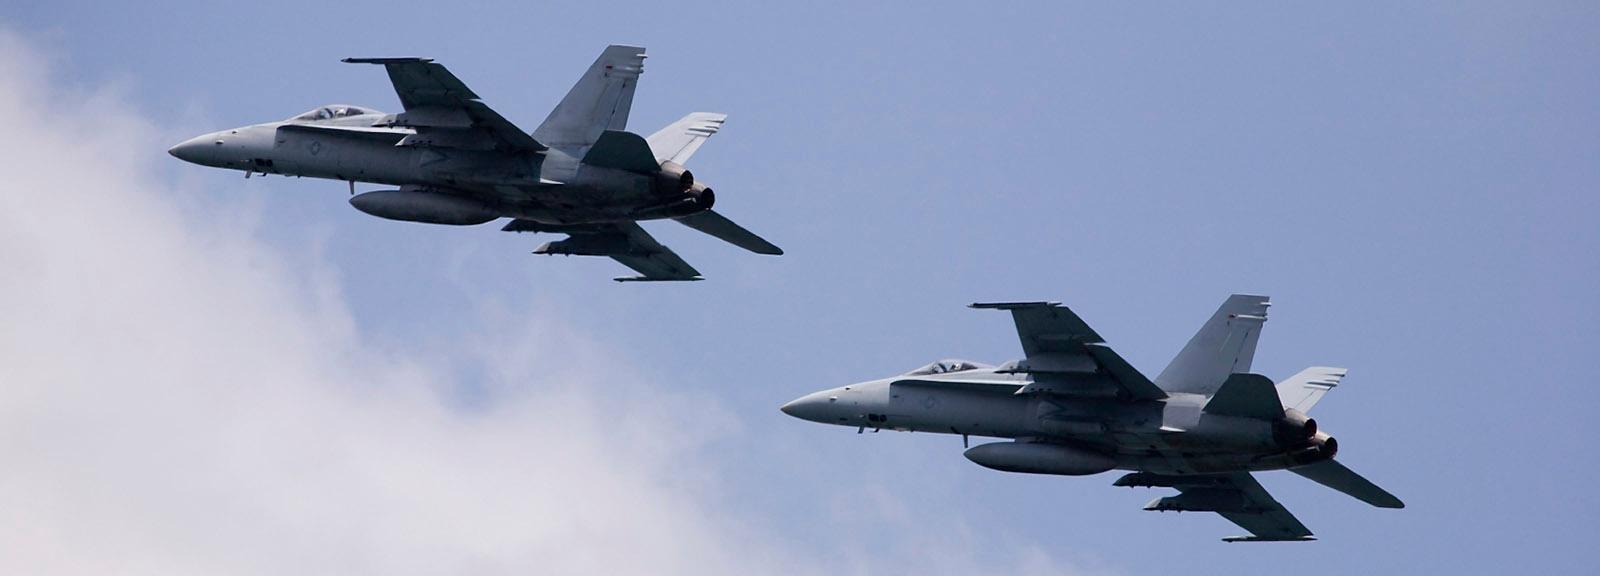 aerospace and defense.jpg